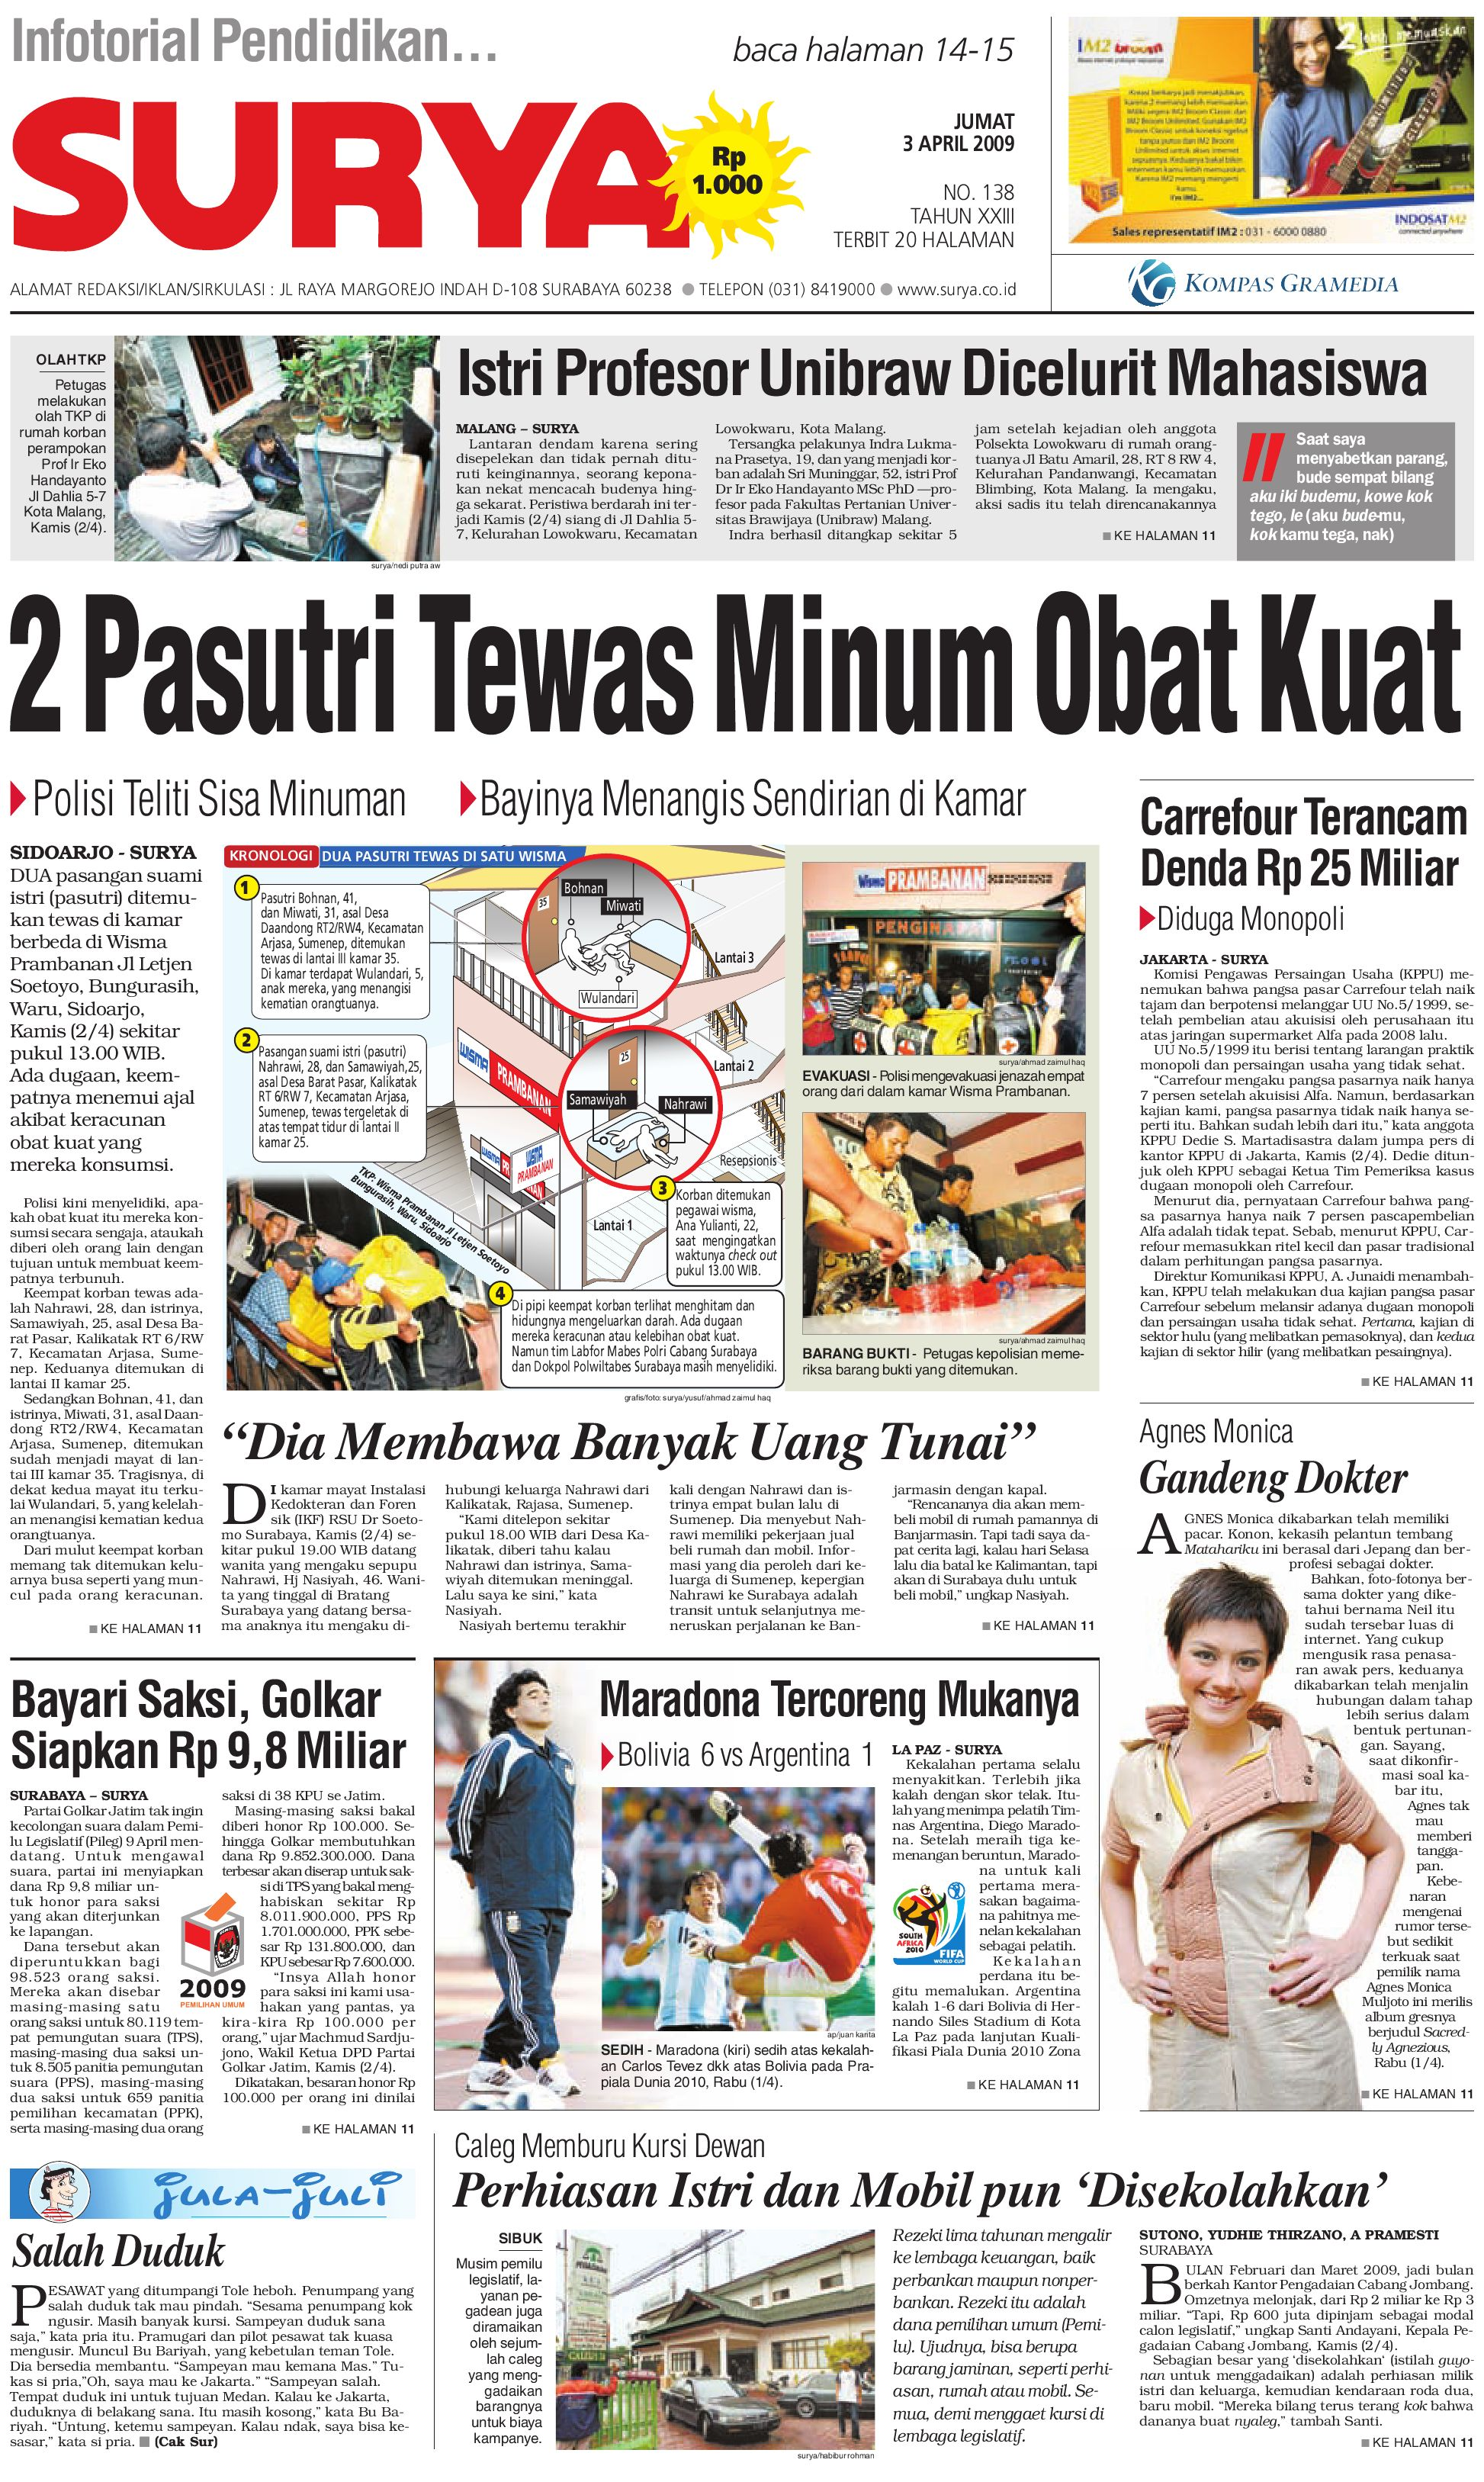 Surya Edisi Cetak 03 Maret 2009 By Harian Issuu Rejeki Anak Soleh 3 Voucher Carrefour Rp 200000